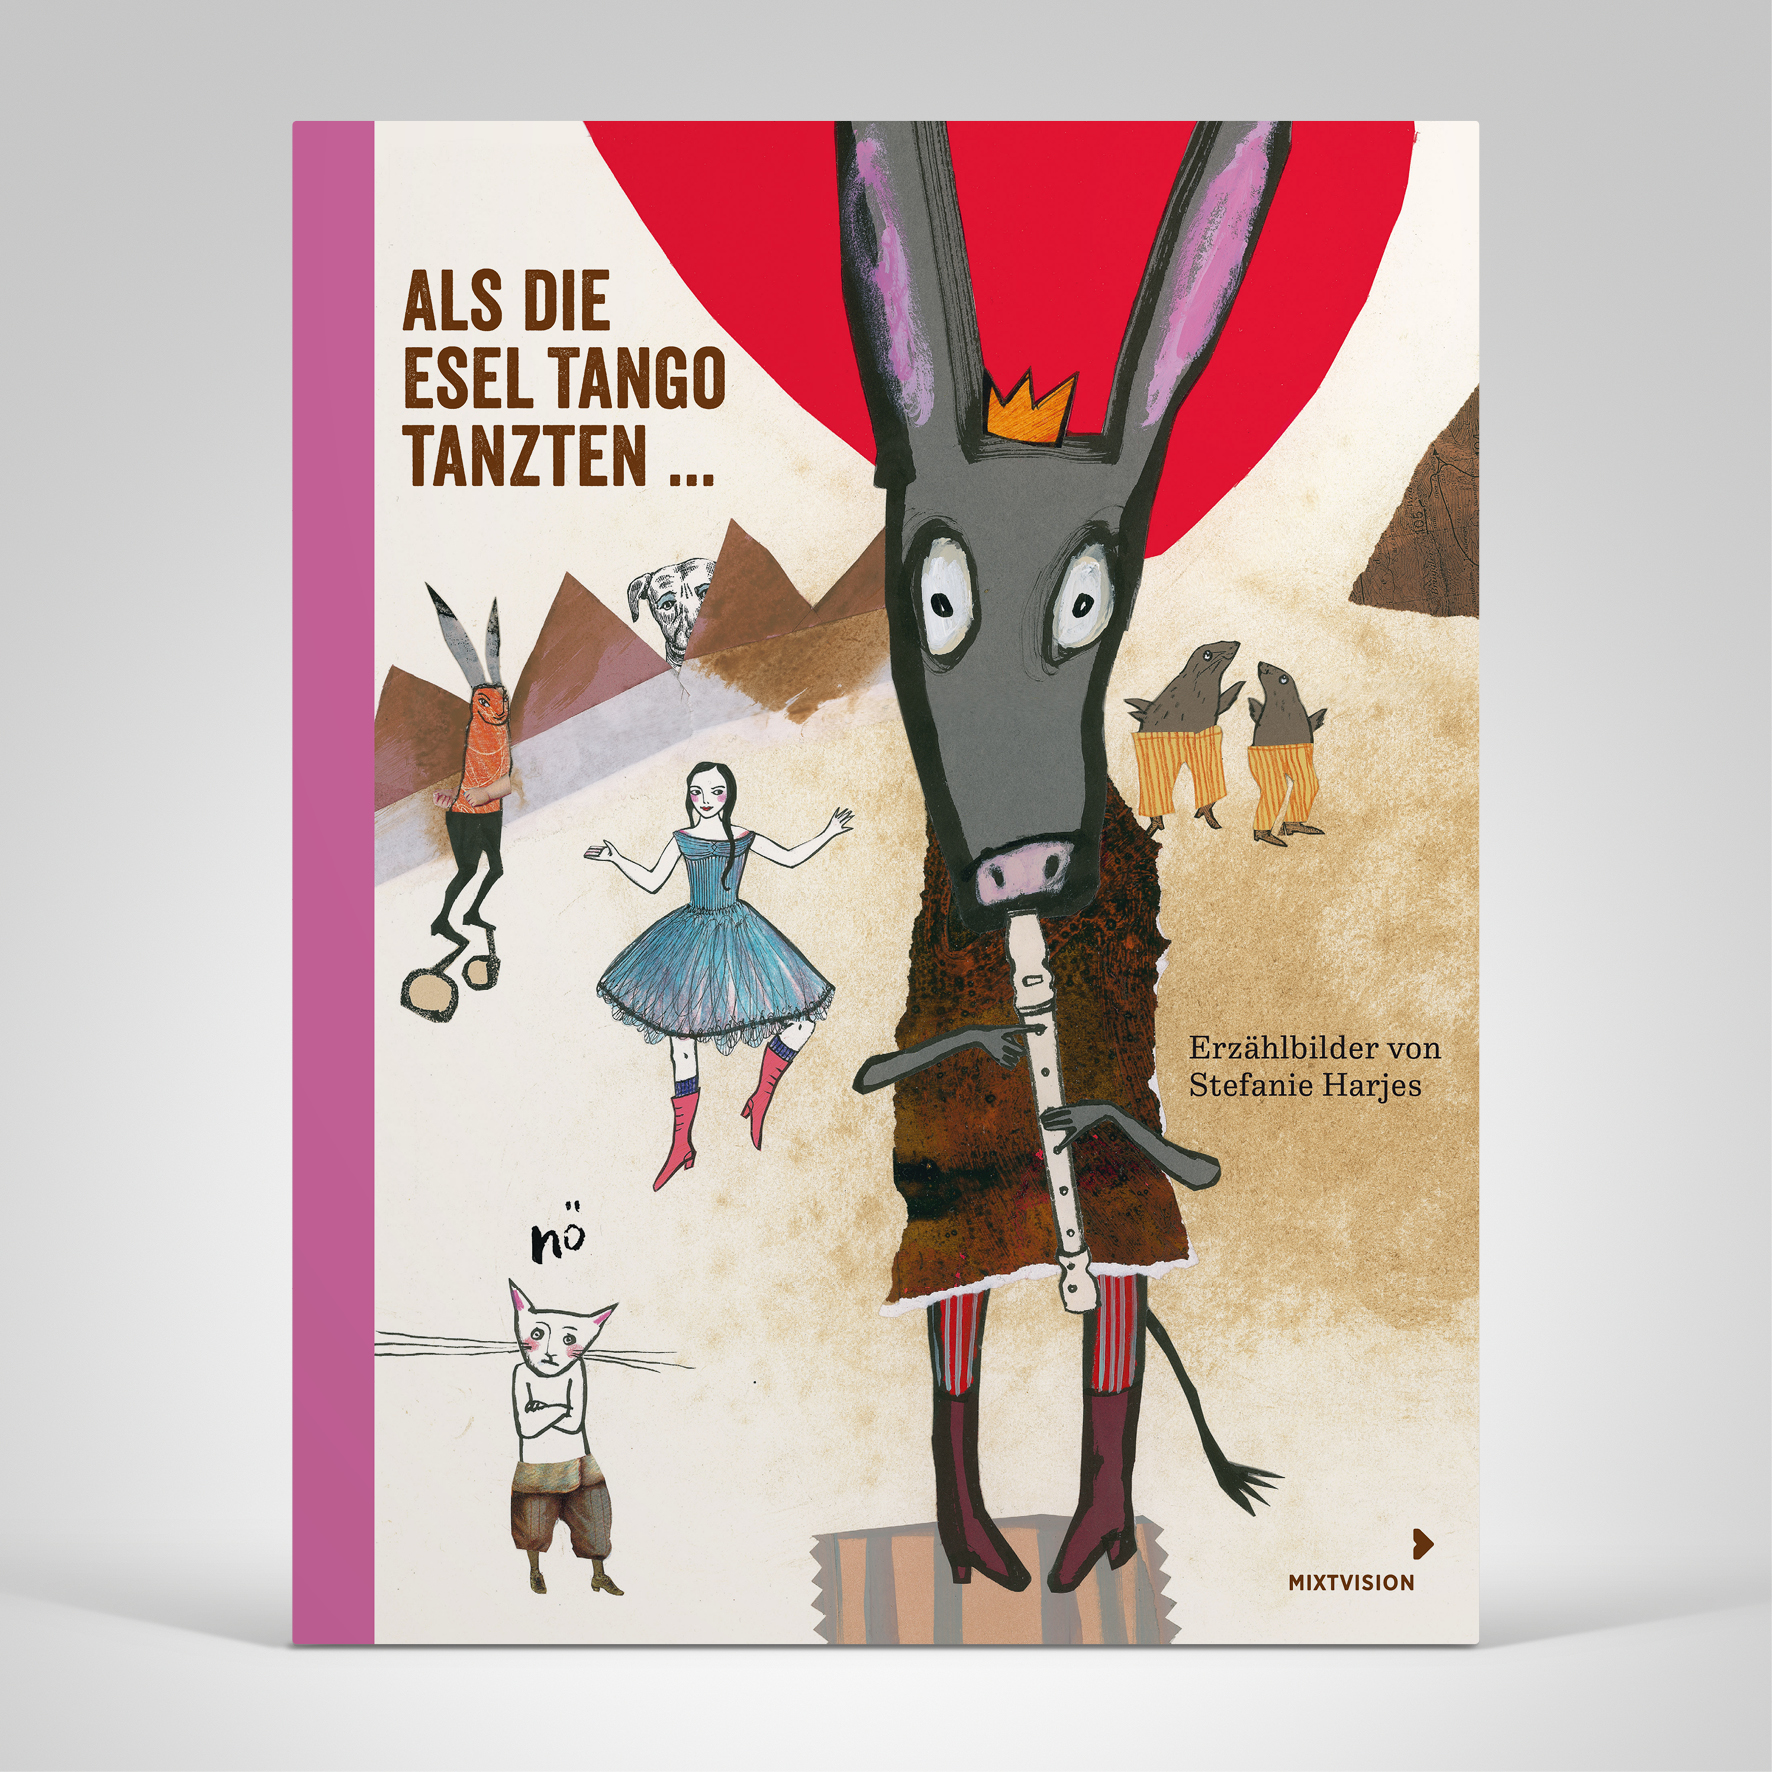 Als die Esel Tango tanzten ..., Cover-Abbildung